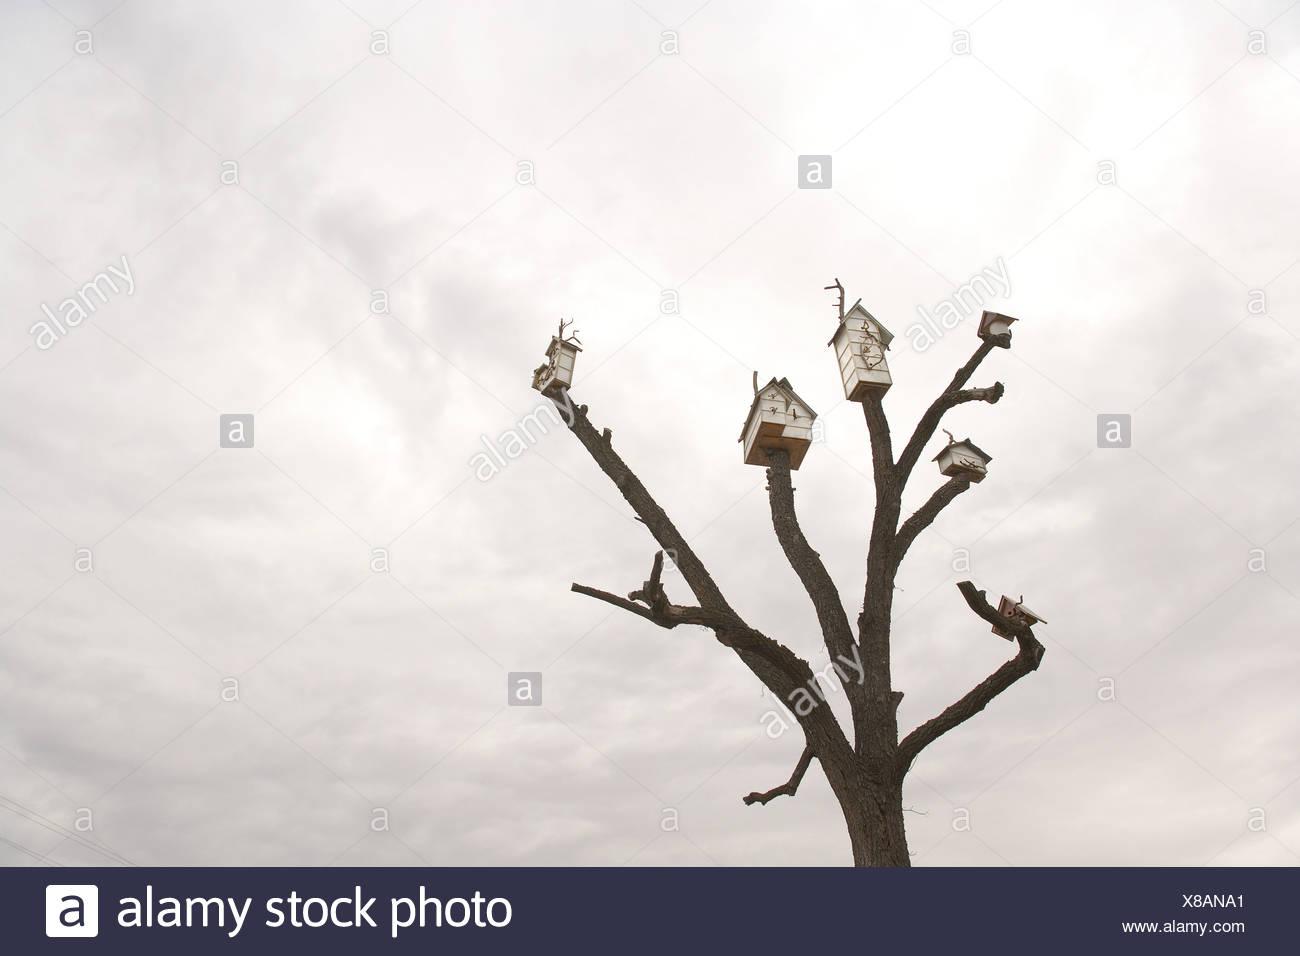 Birdhouses on tree against overcast sky - Stock Image